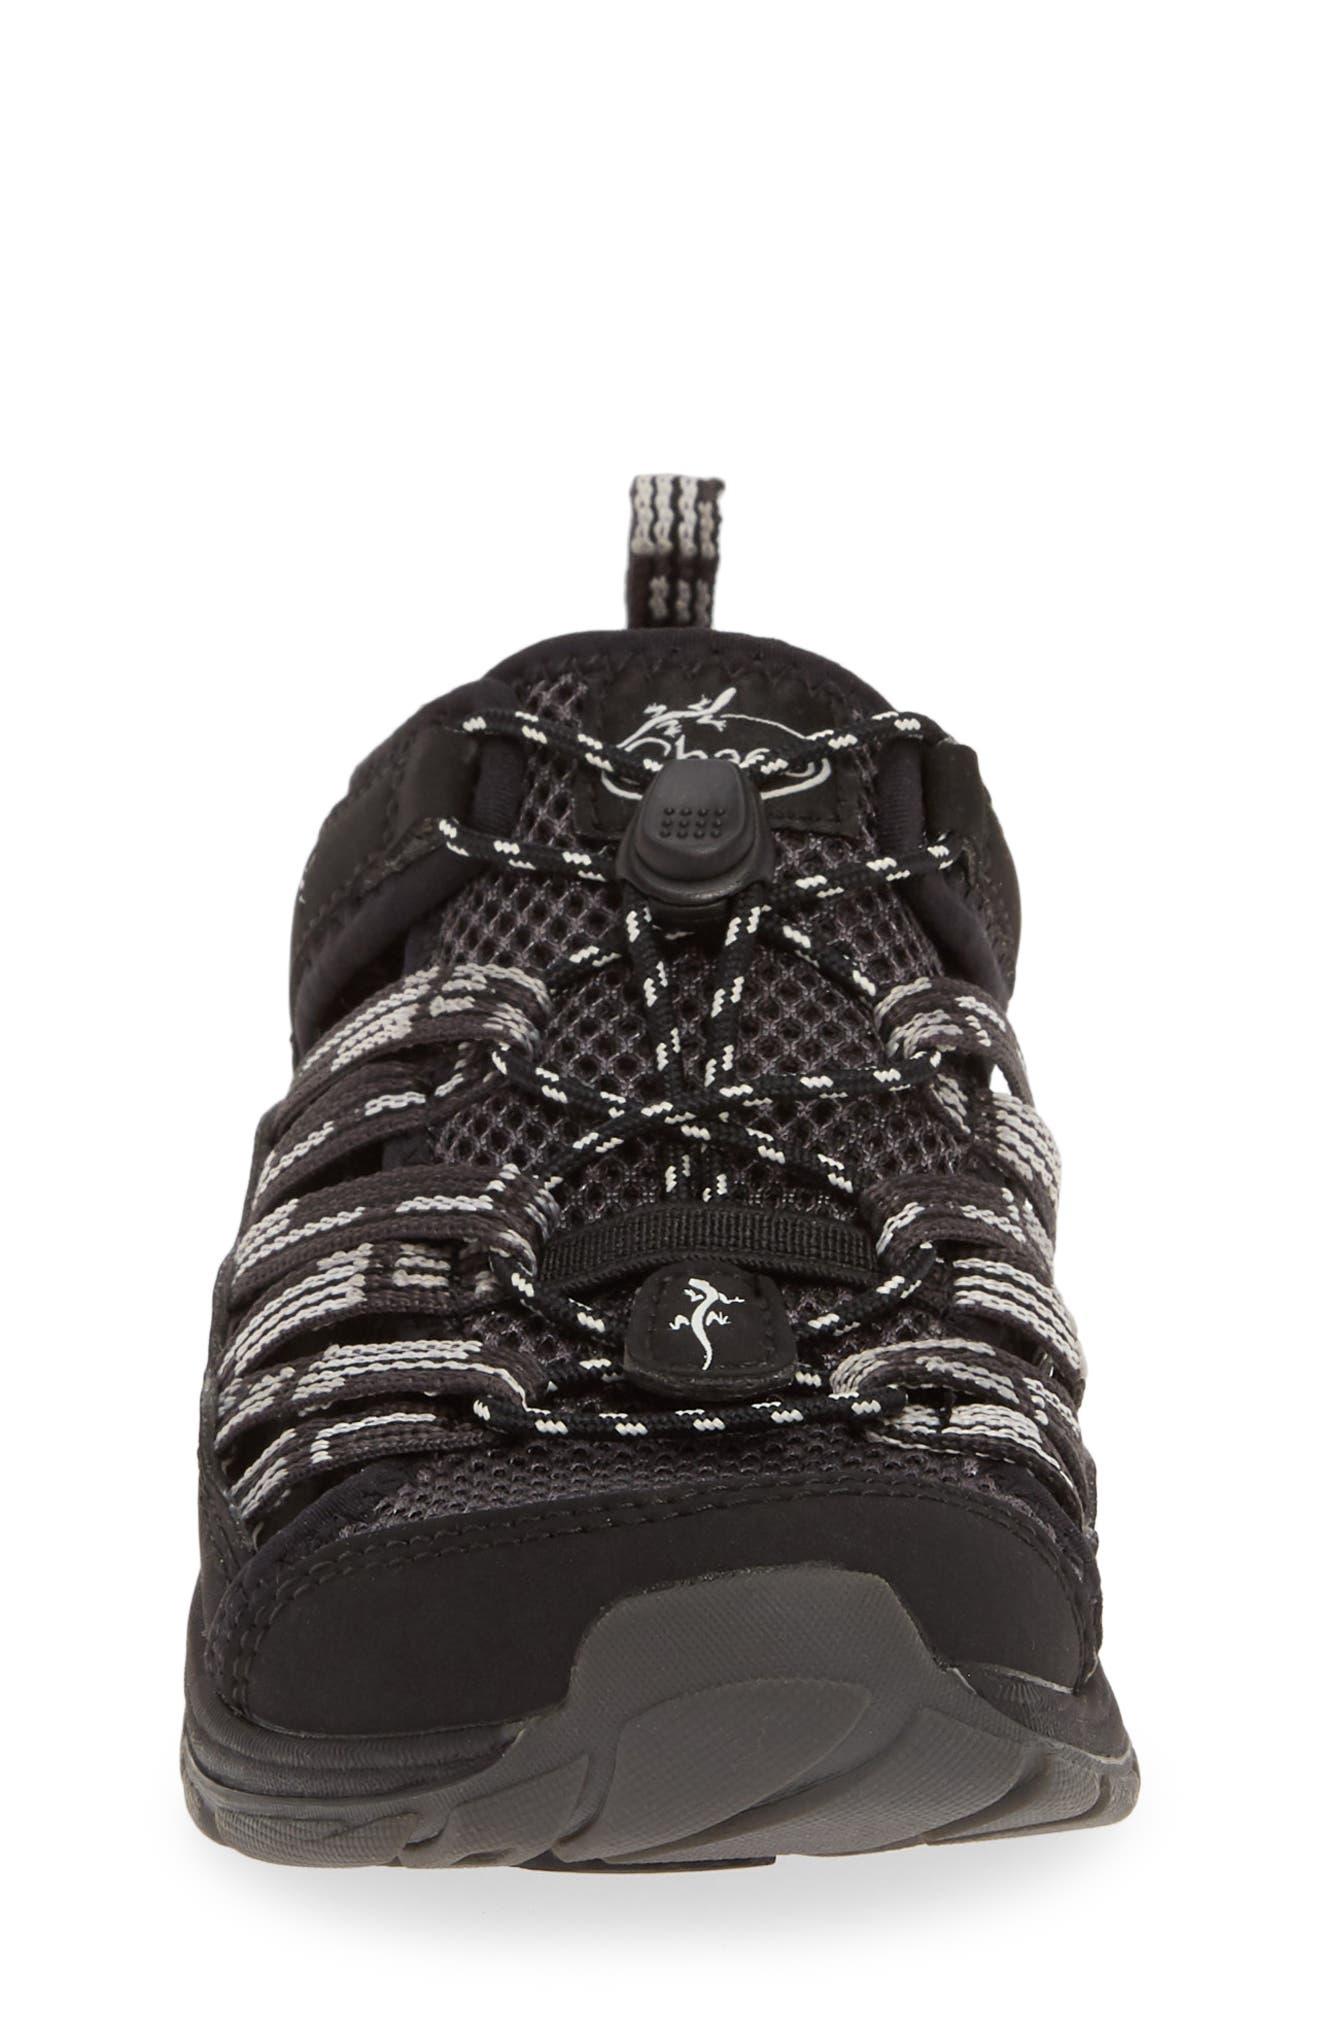 CHACO, Outcross 2 Water Sneaker, Alternate thumbnail 4, color, PAVEMENT BLACK